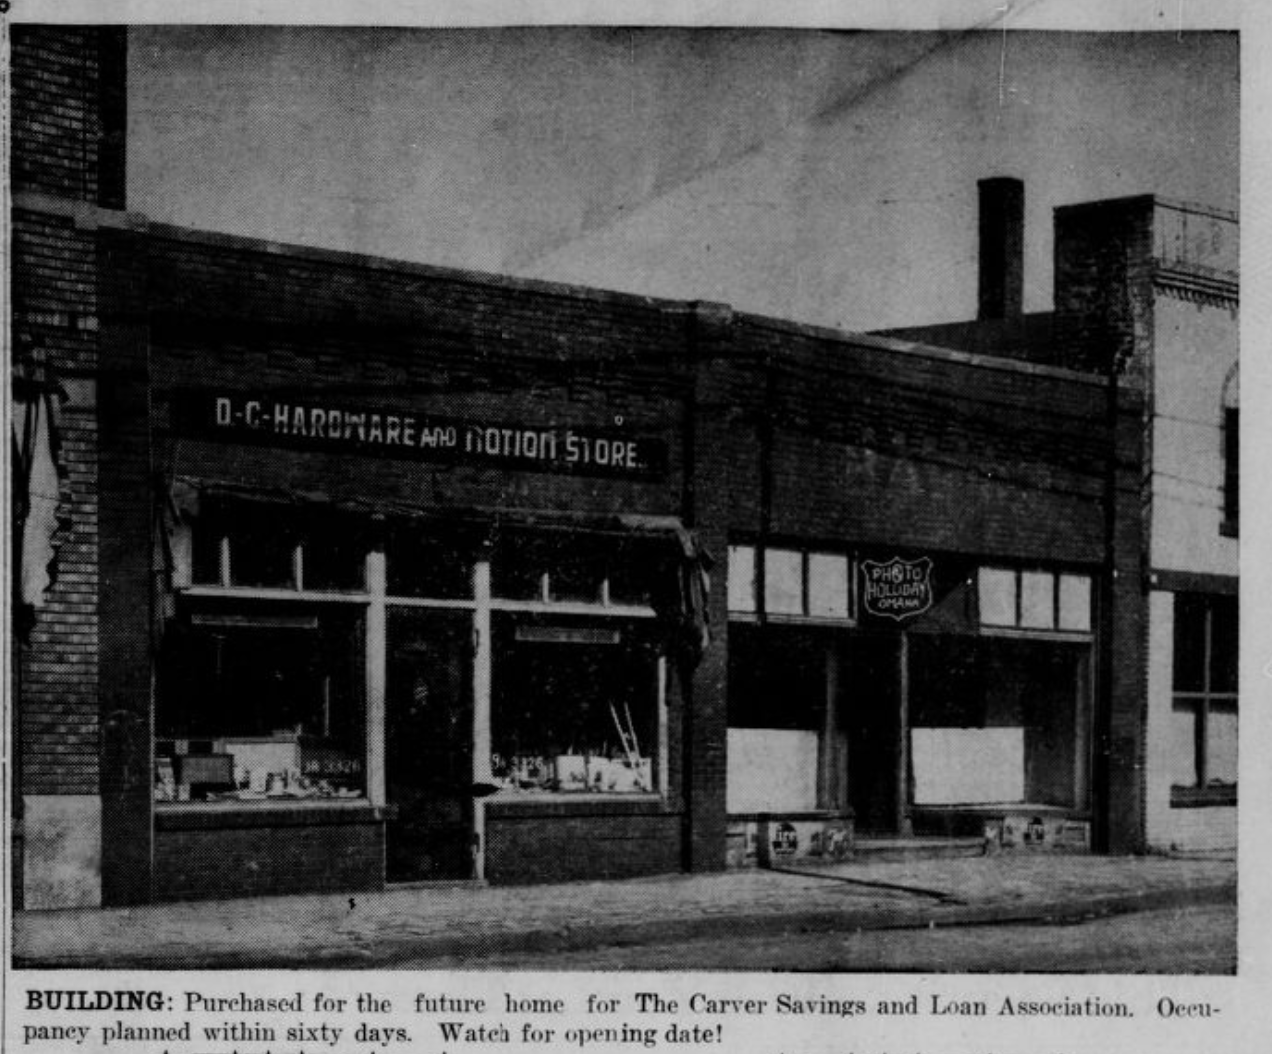 Carver Savings and Loan building at 2416 Lake Street, North Omaha, Nebraska